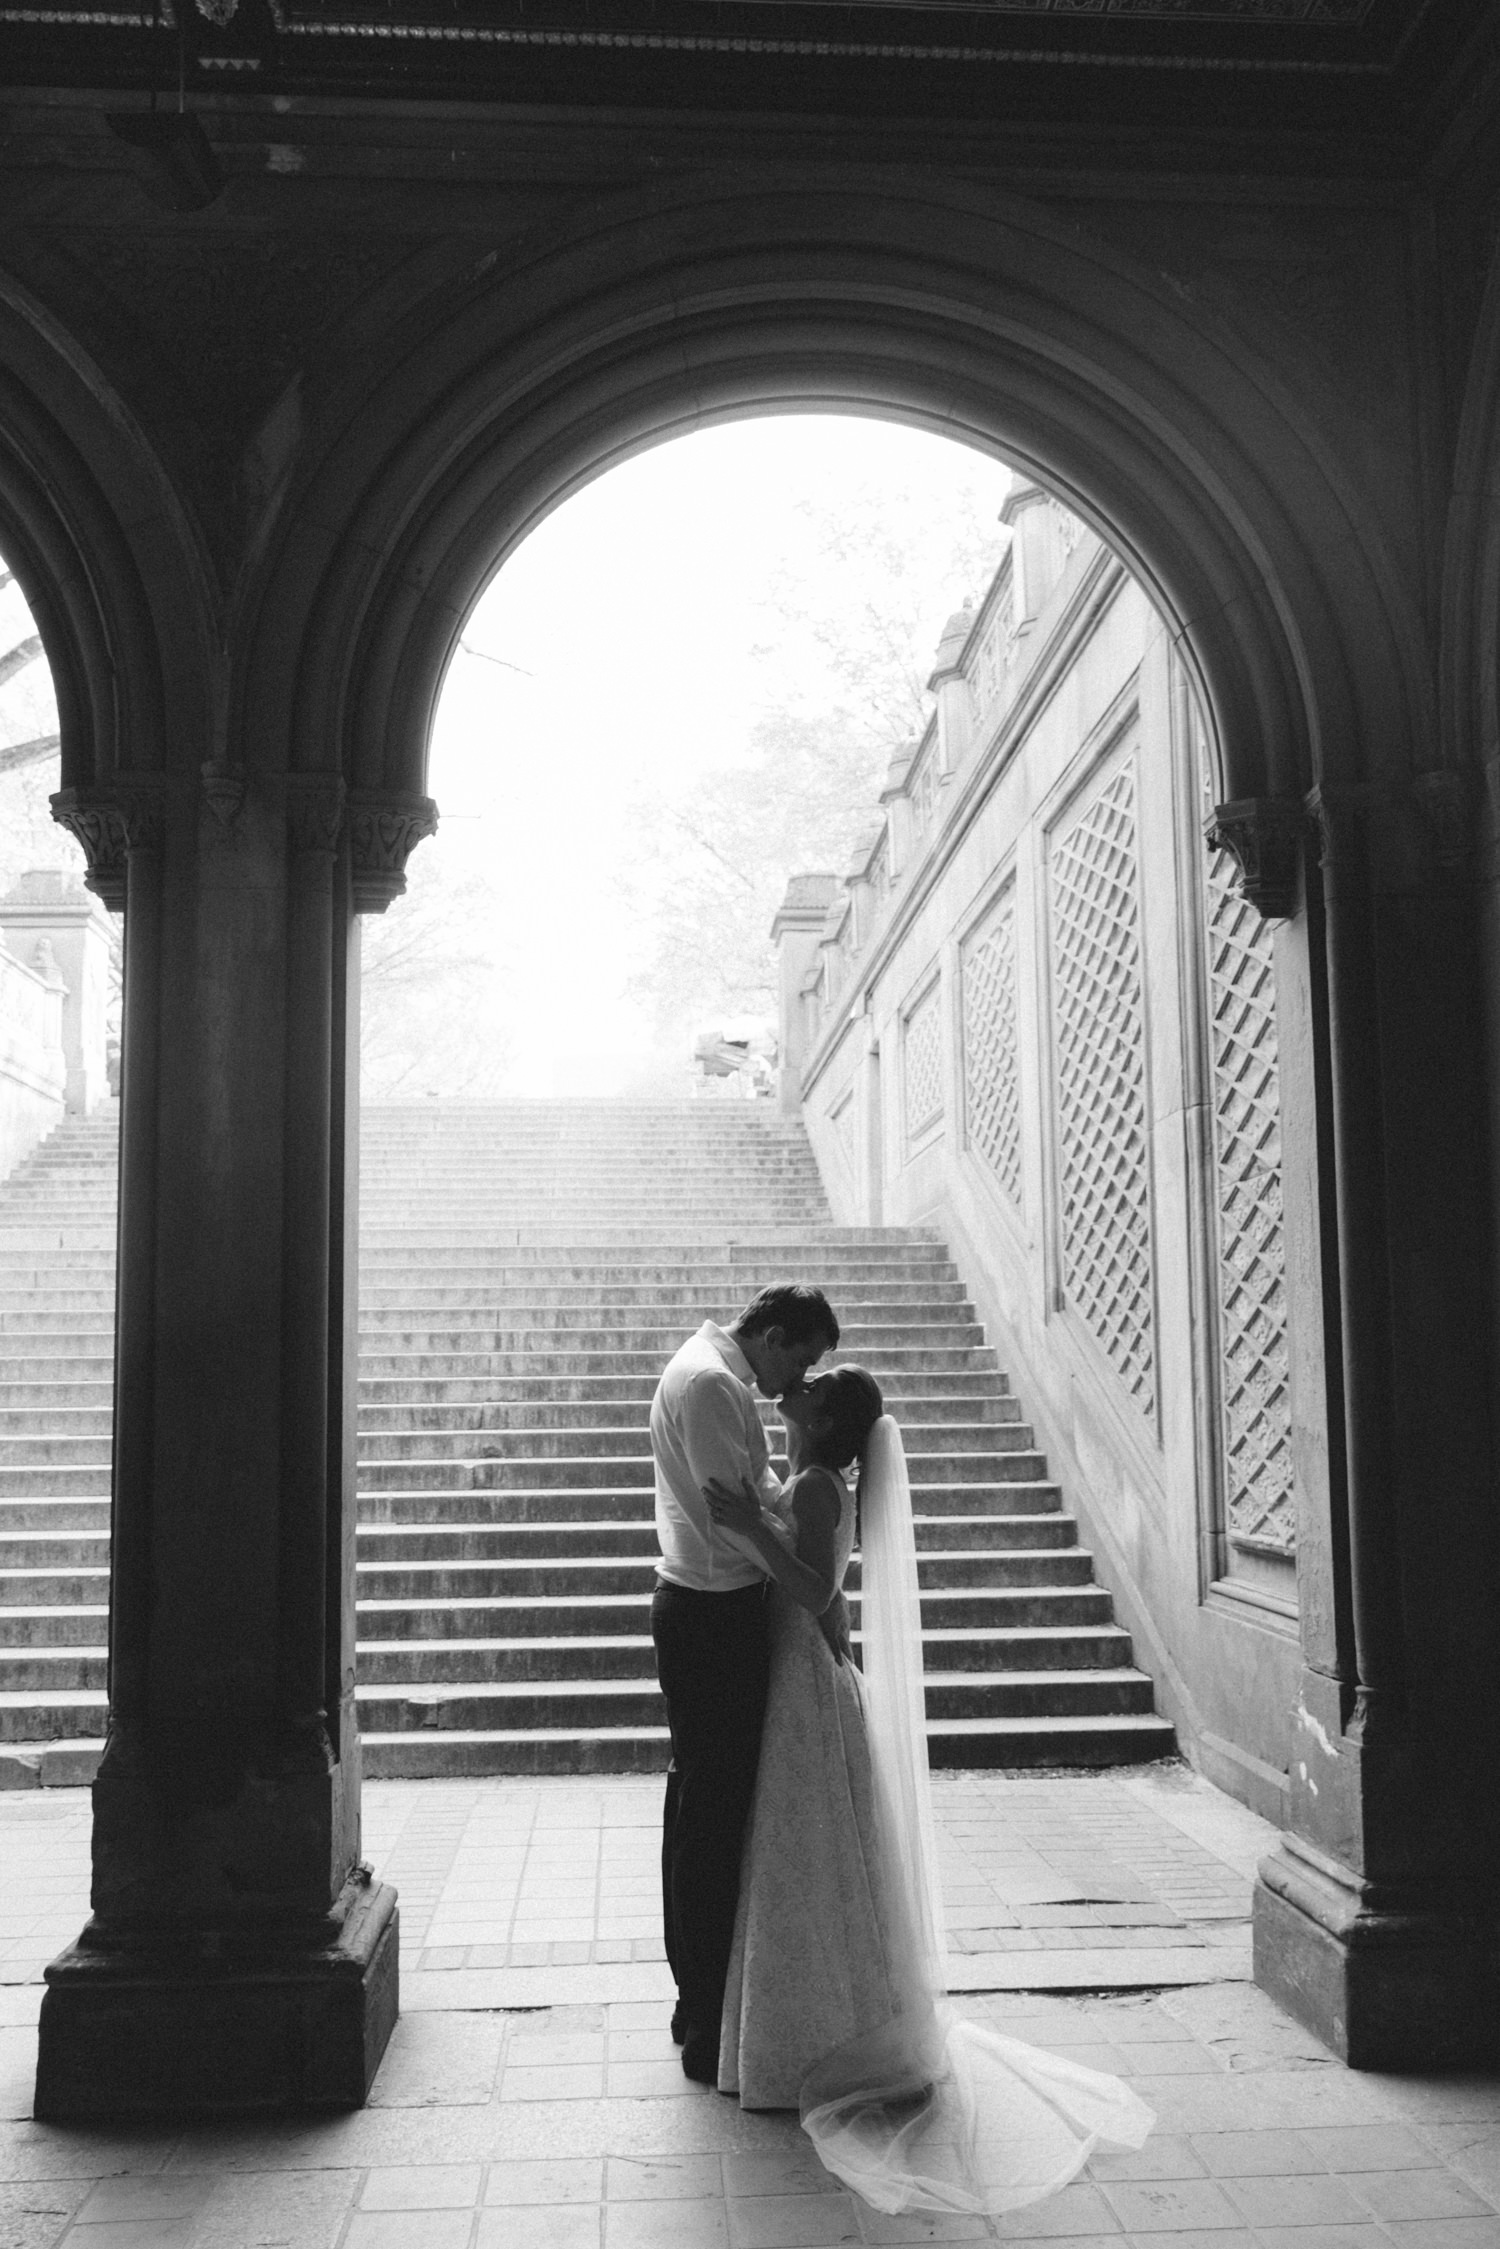 NYC-Top-of-the-Rock-wedding-photos-L&B-14.jpg